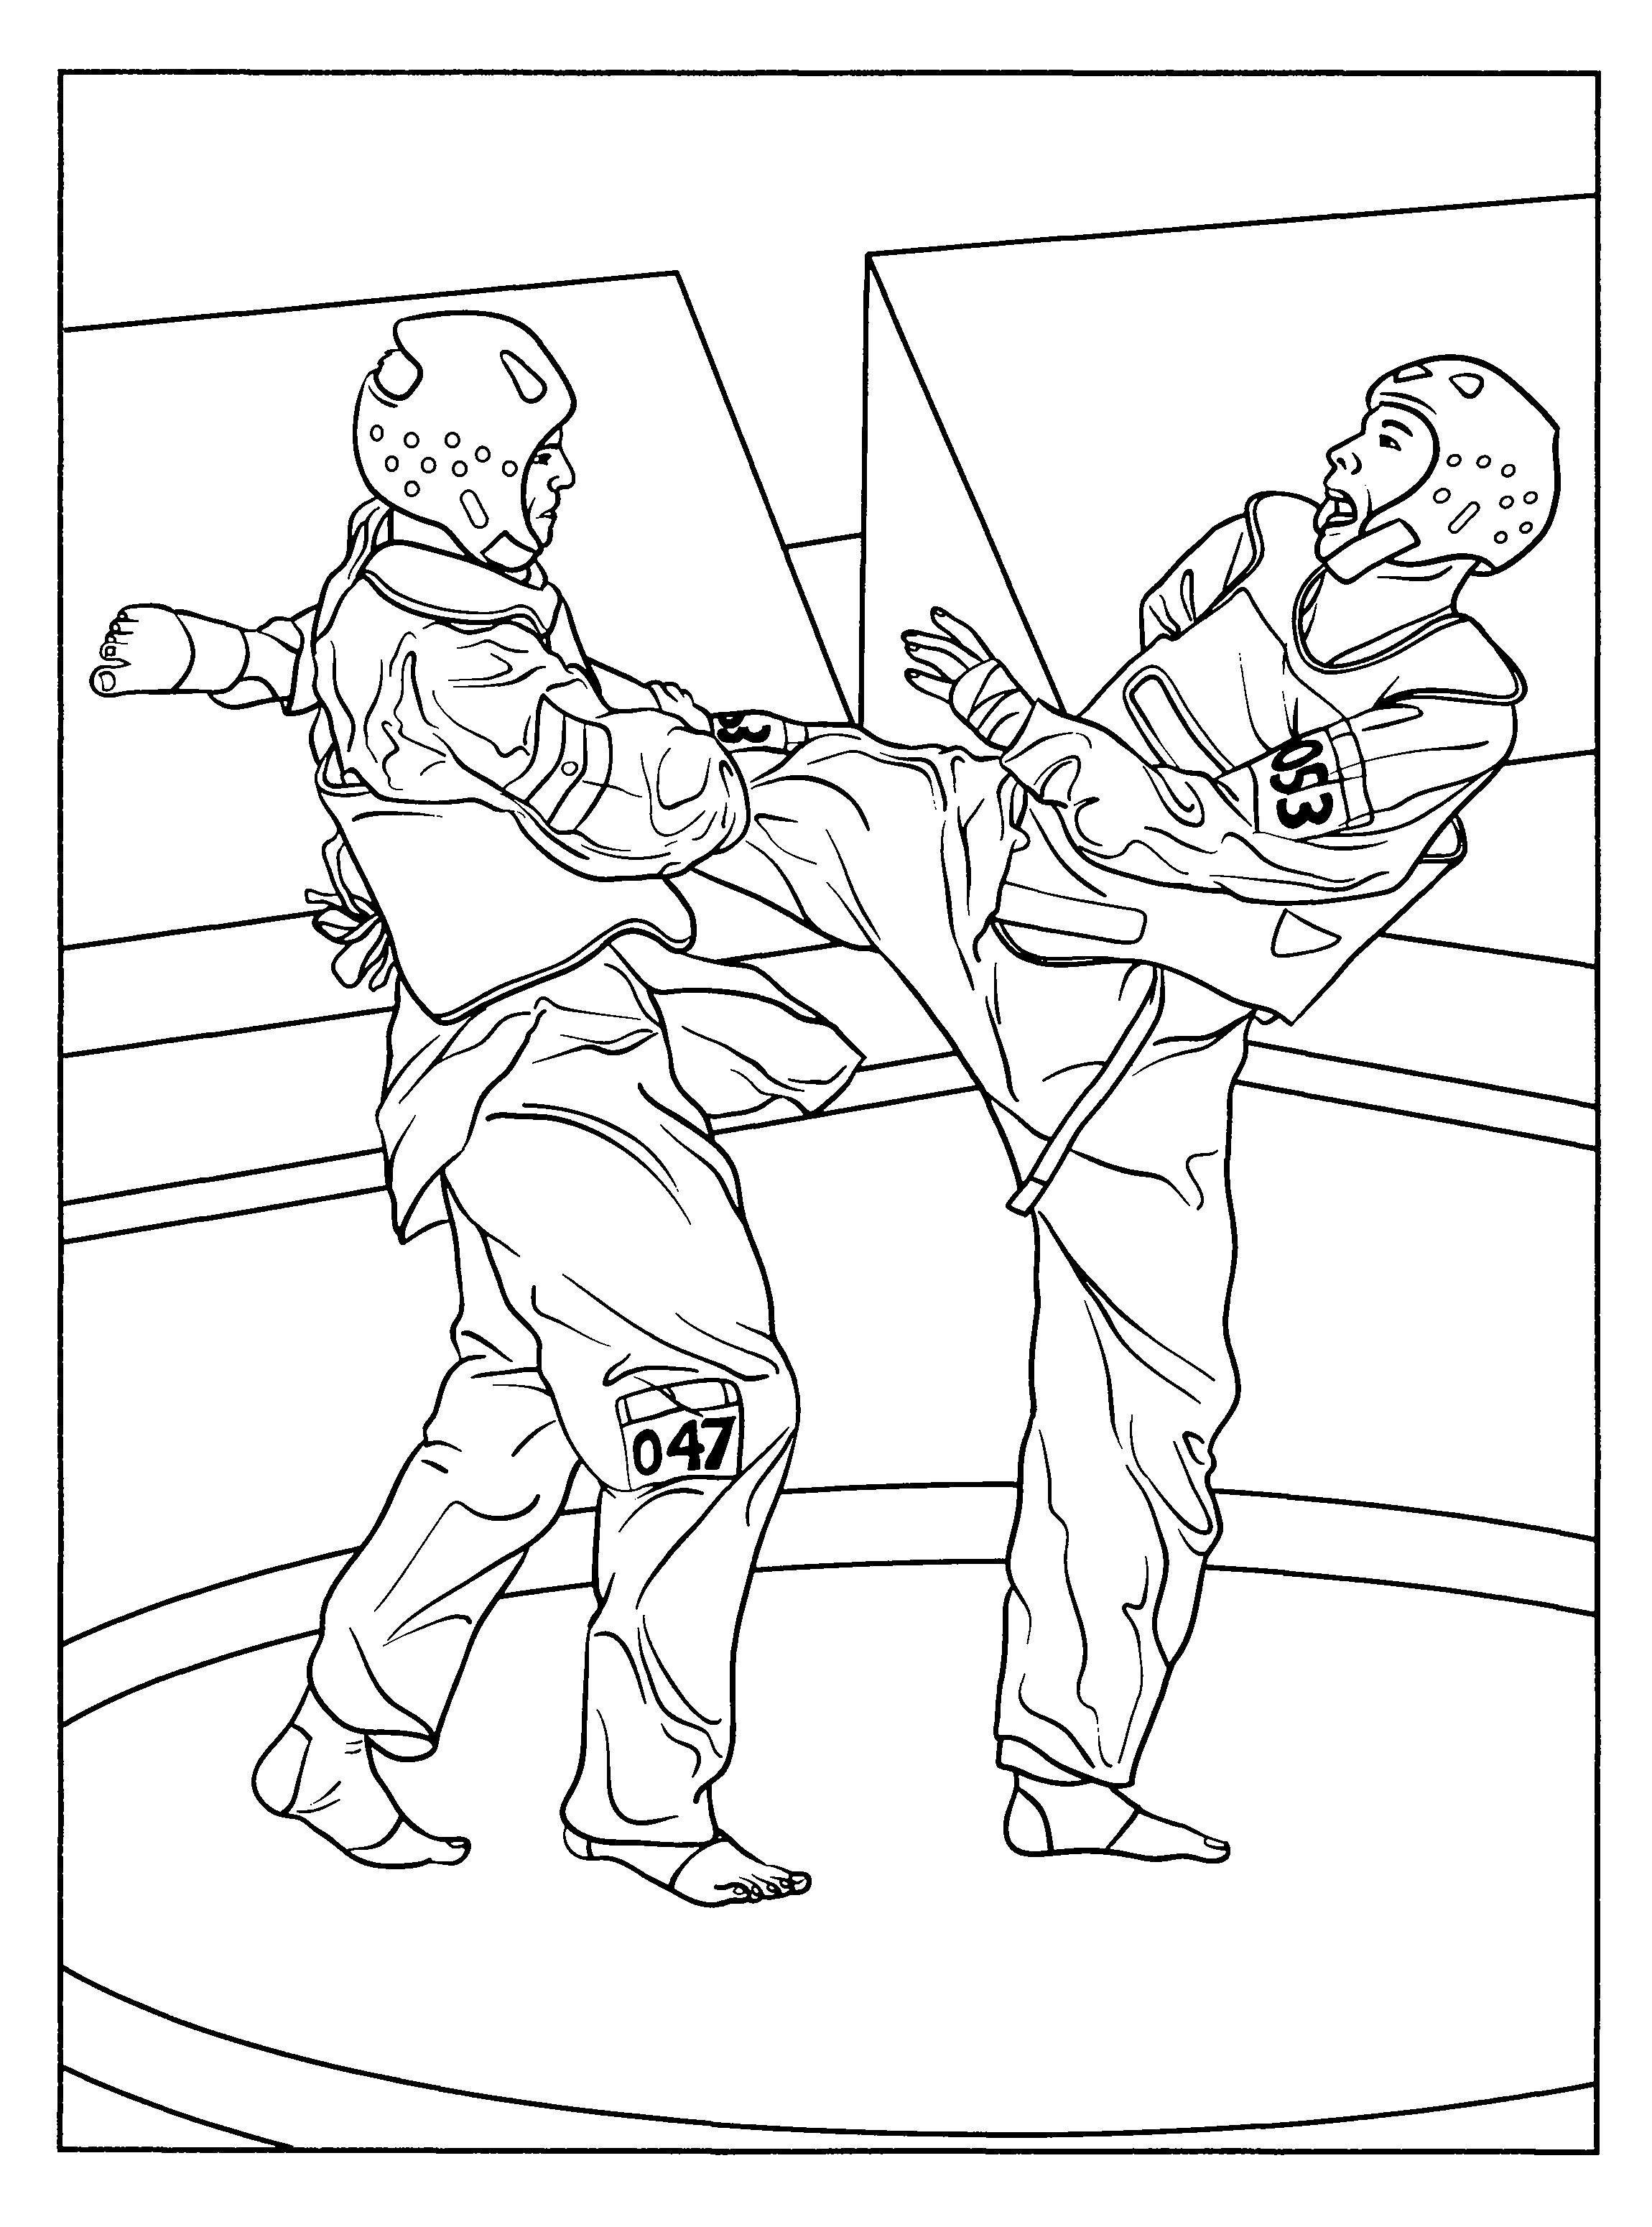 Free Printable Karate Coloring Pages